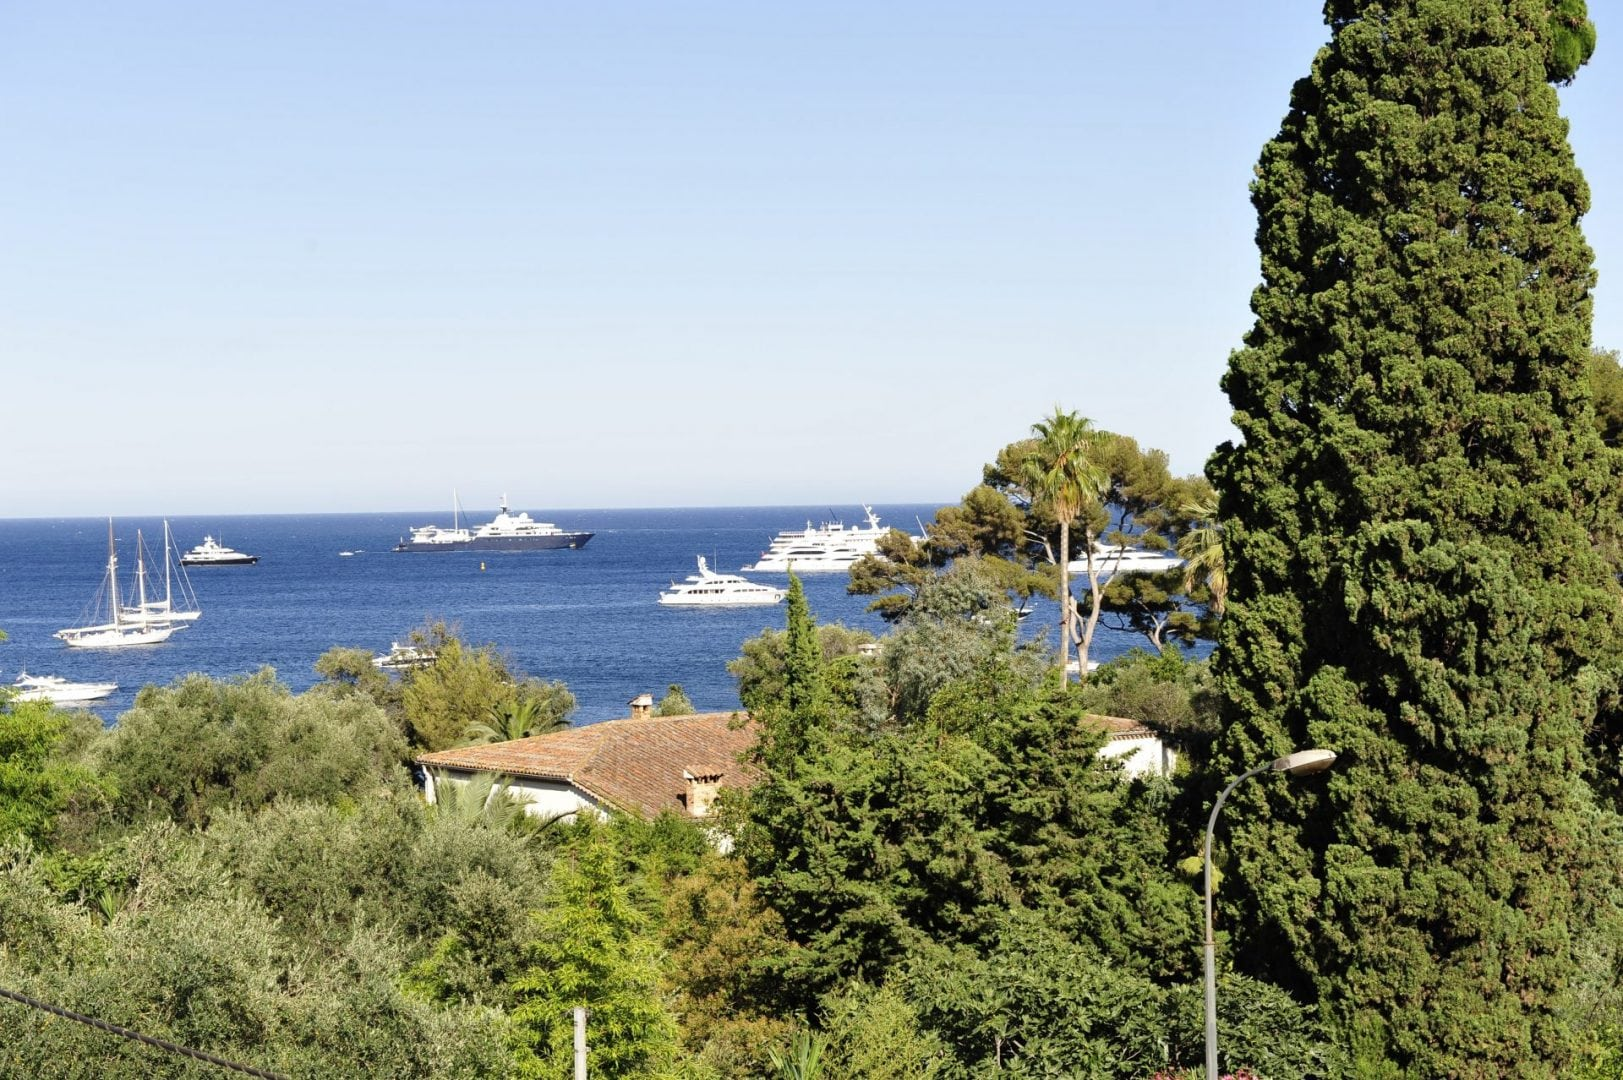 Luxury villa, sleeps 10, St. Jean Cap Ferrat, beach, two private pools